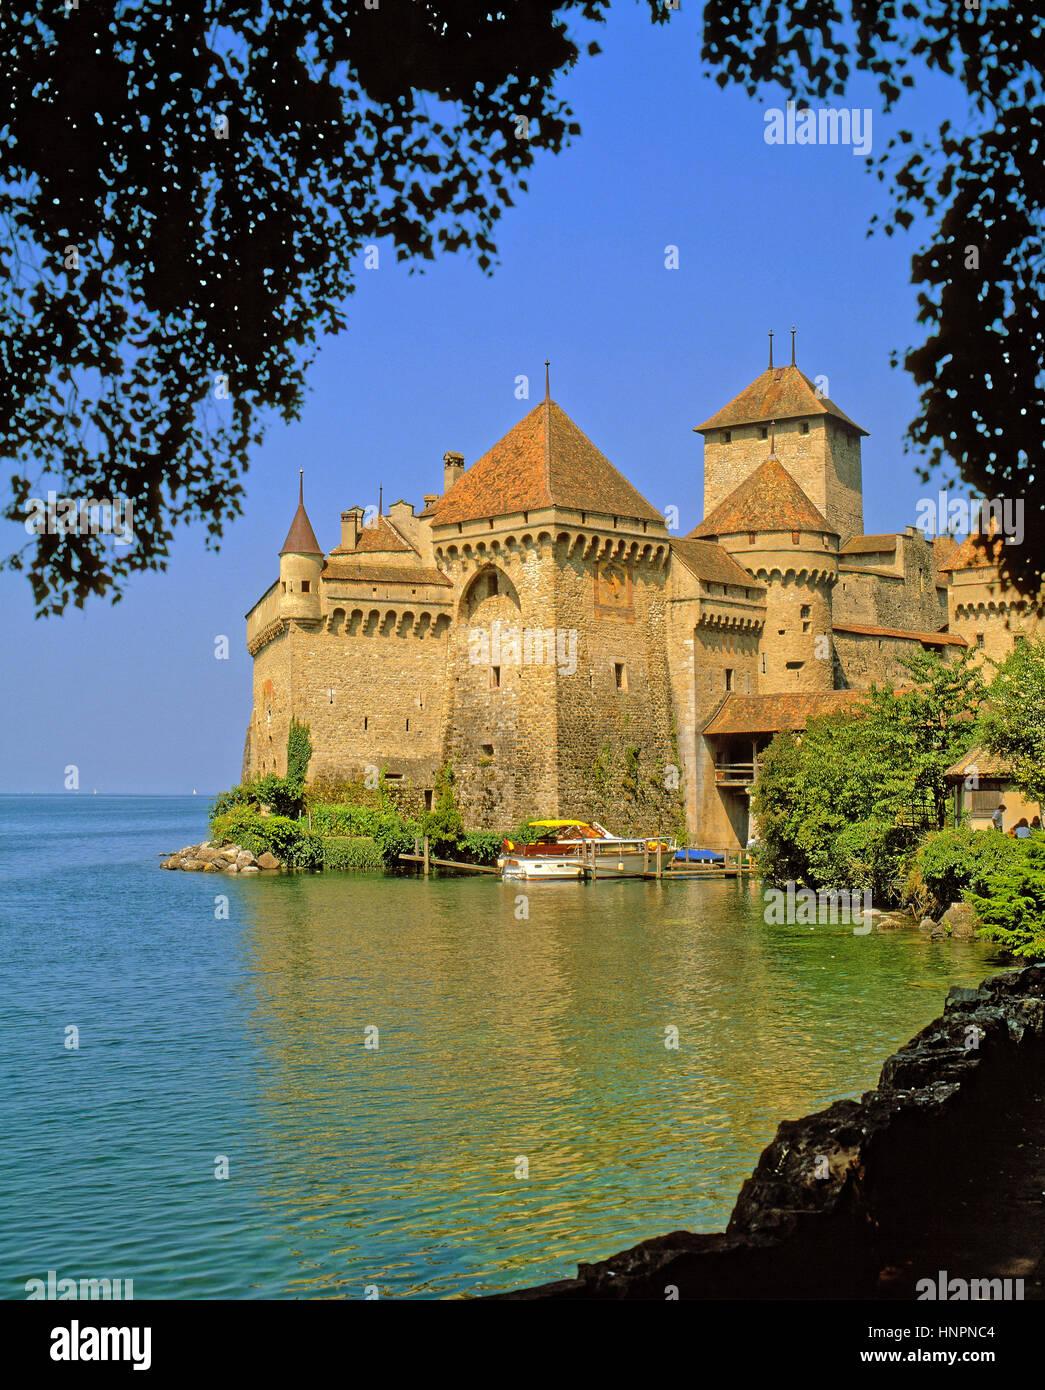 Chateau Chillon on the banks of Lake Leman (Lake Geneva) near Montreux, Switzerland. Stock Photo